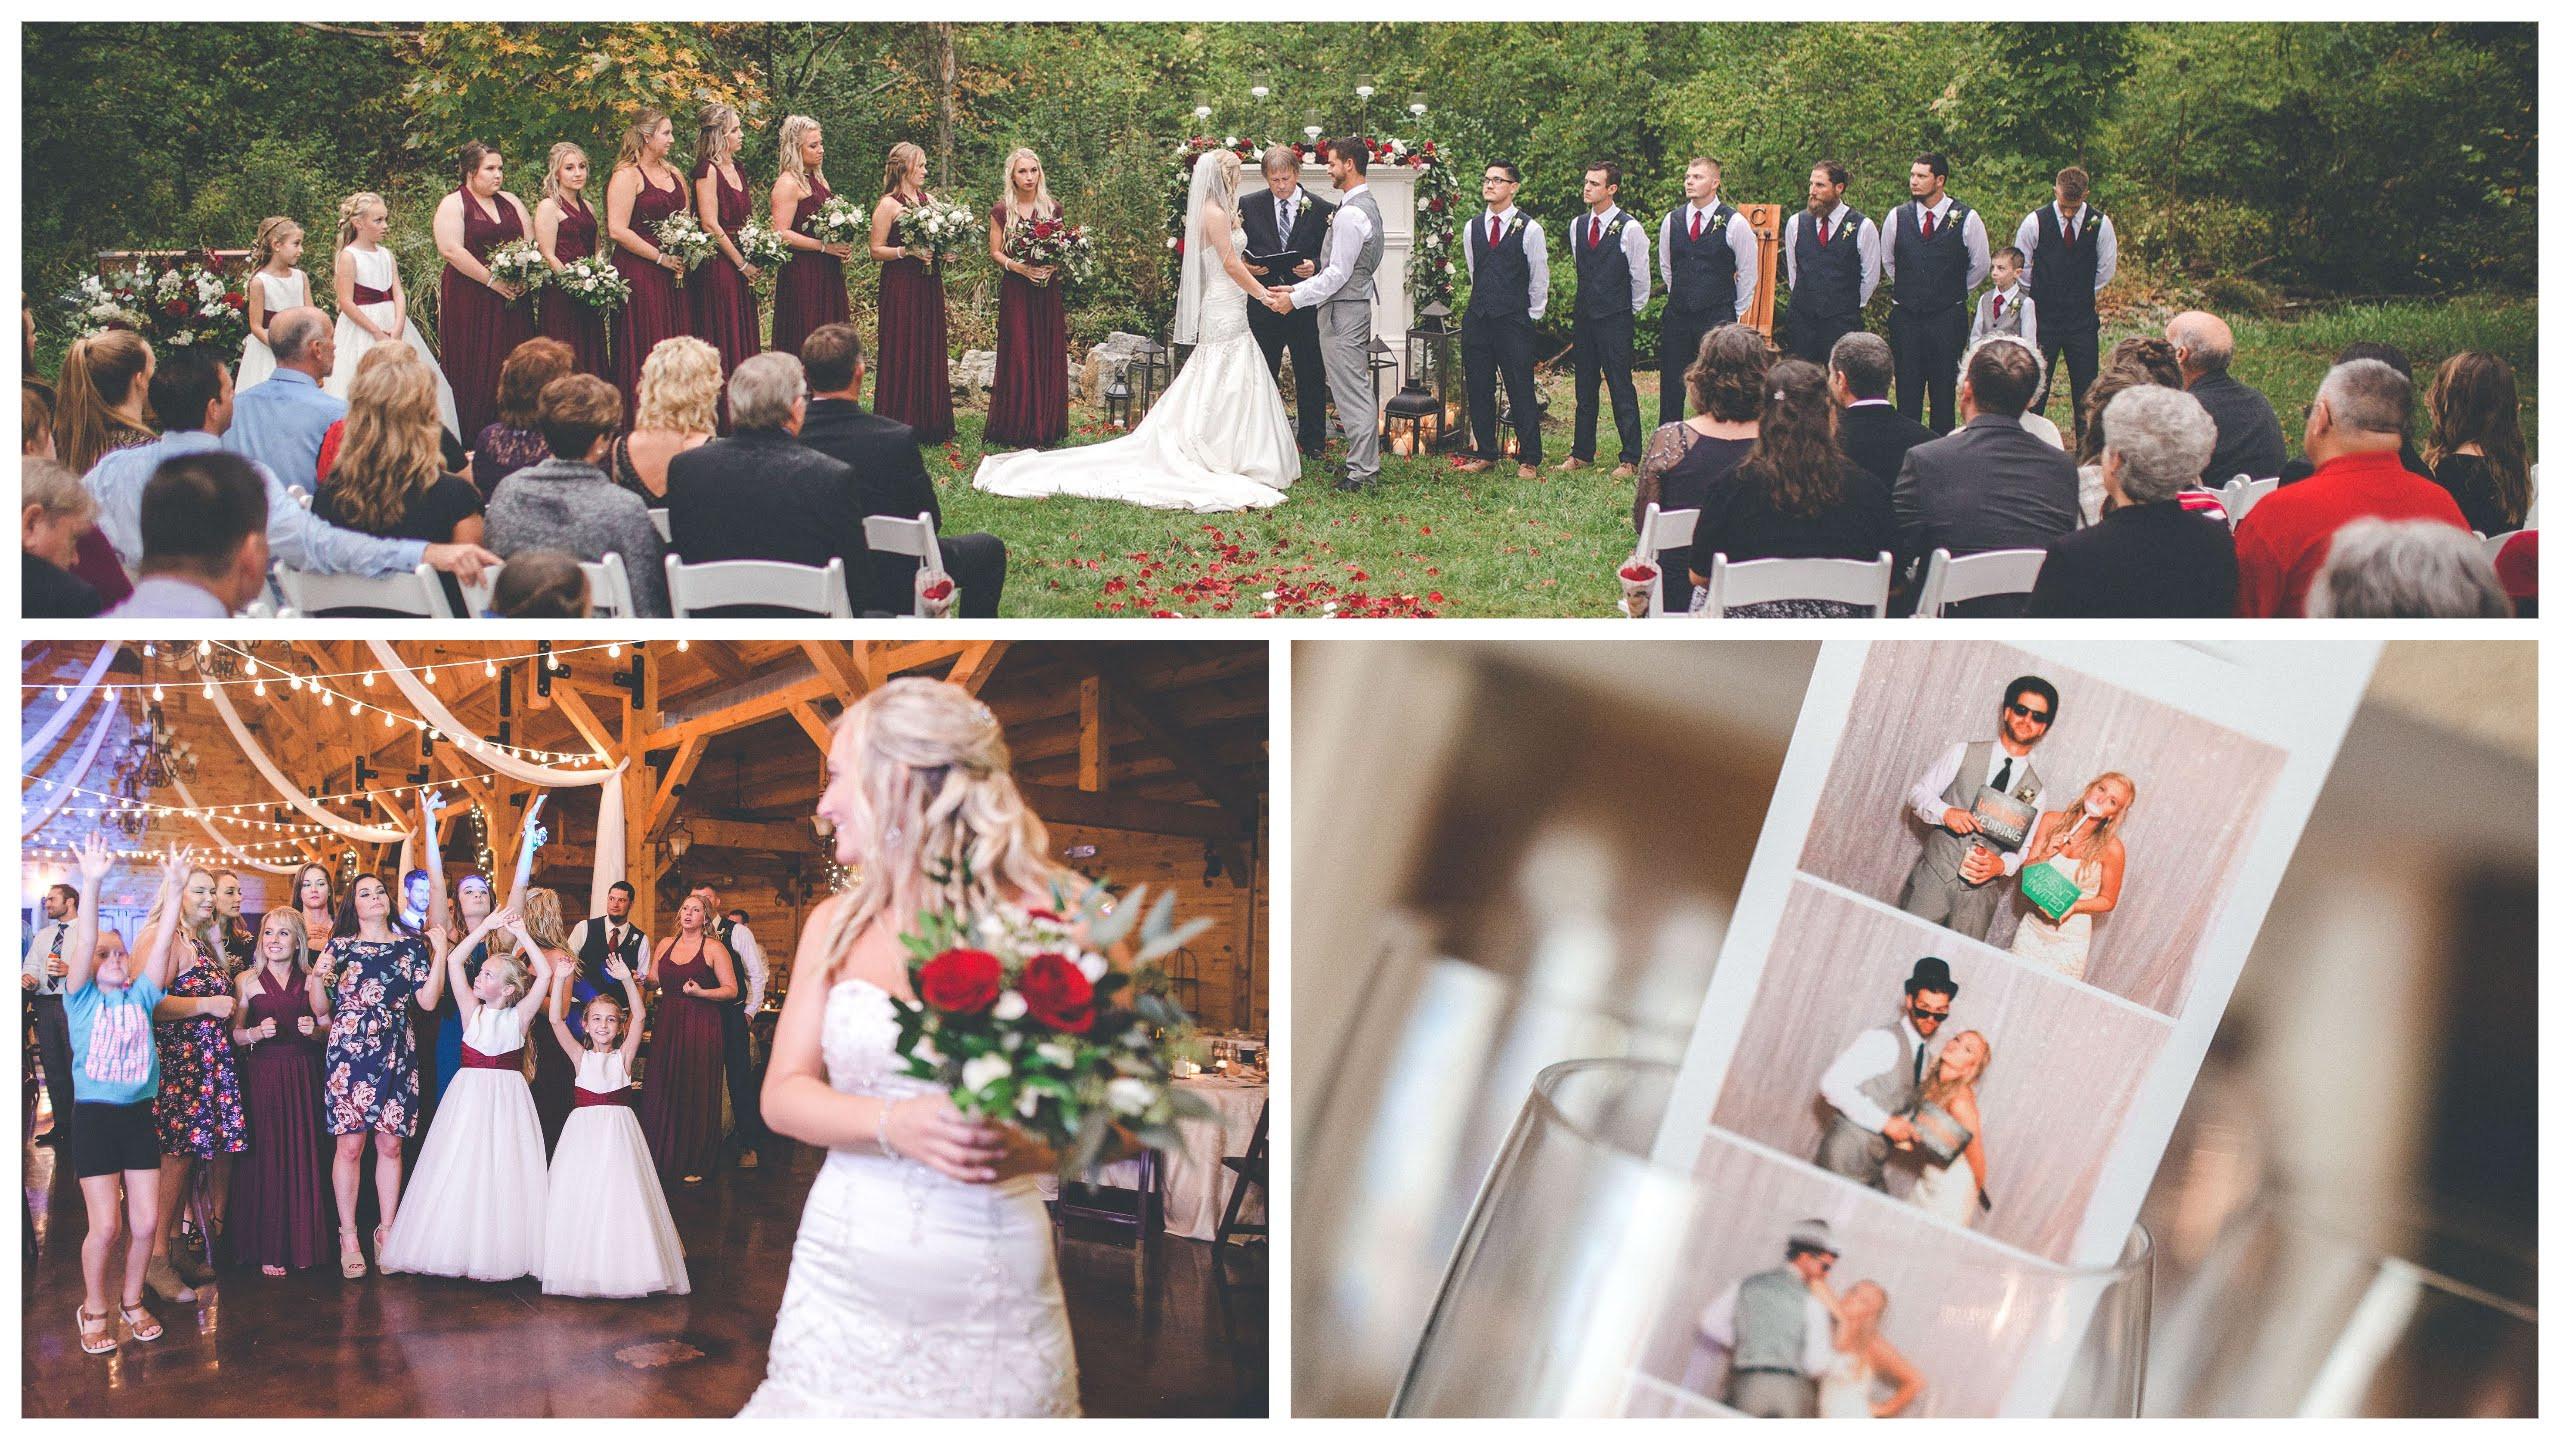 Ceremony, Reception & Photo Booth